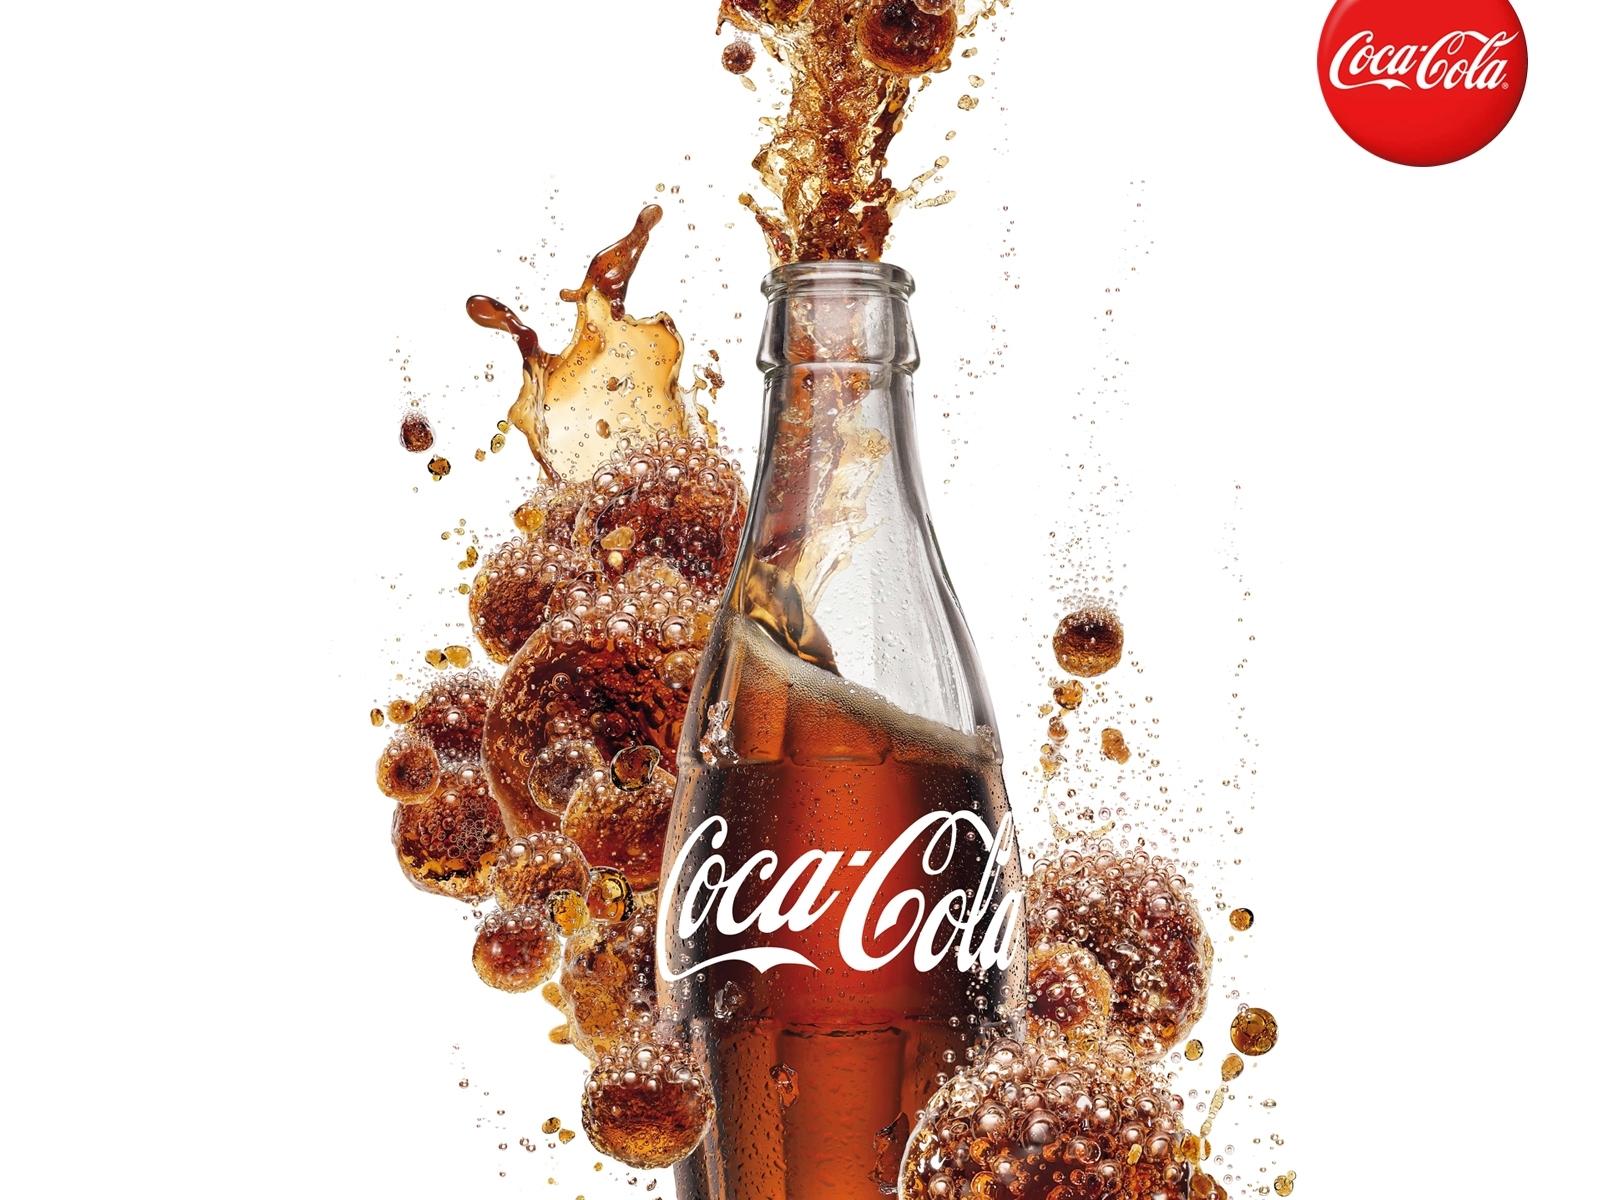 coca cola bottle hd wallpaper high resolution #nqf > jinqiaojs